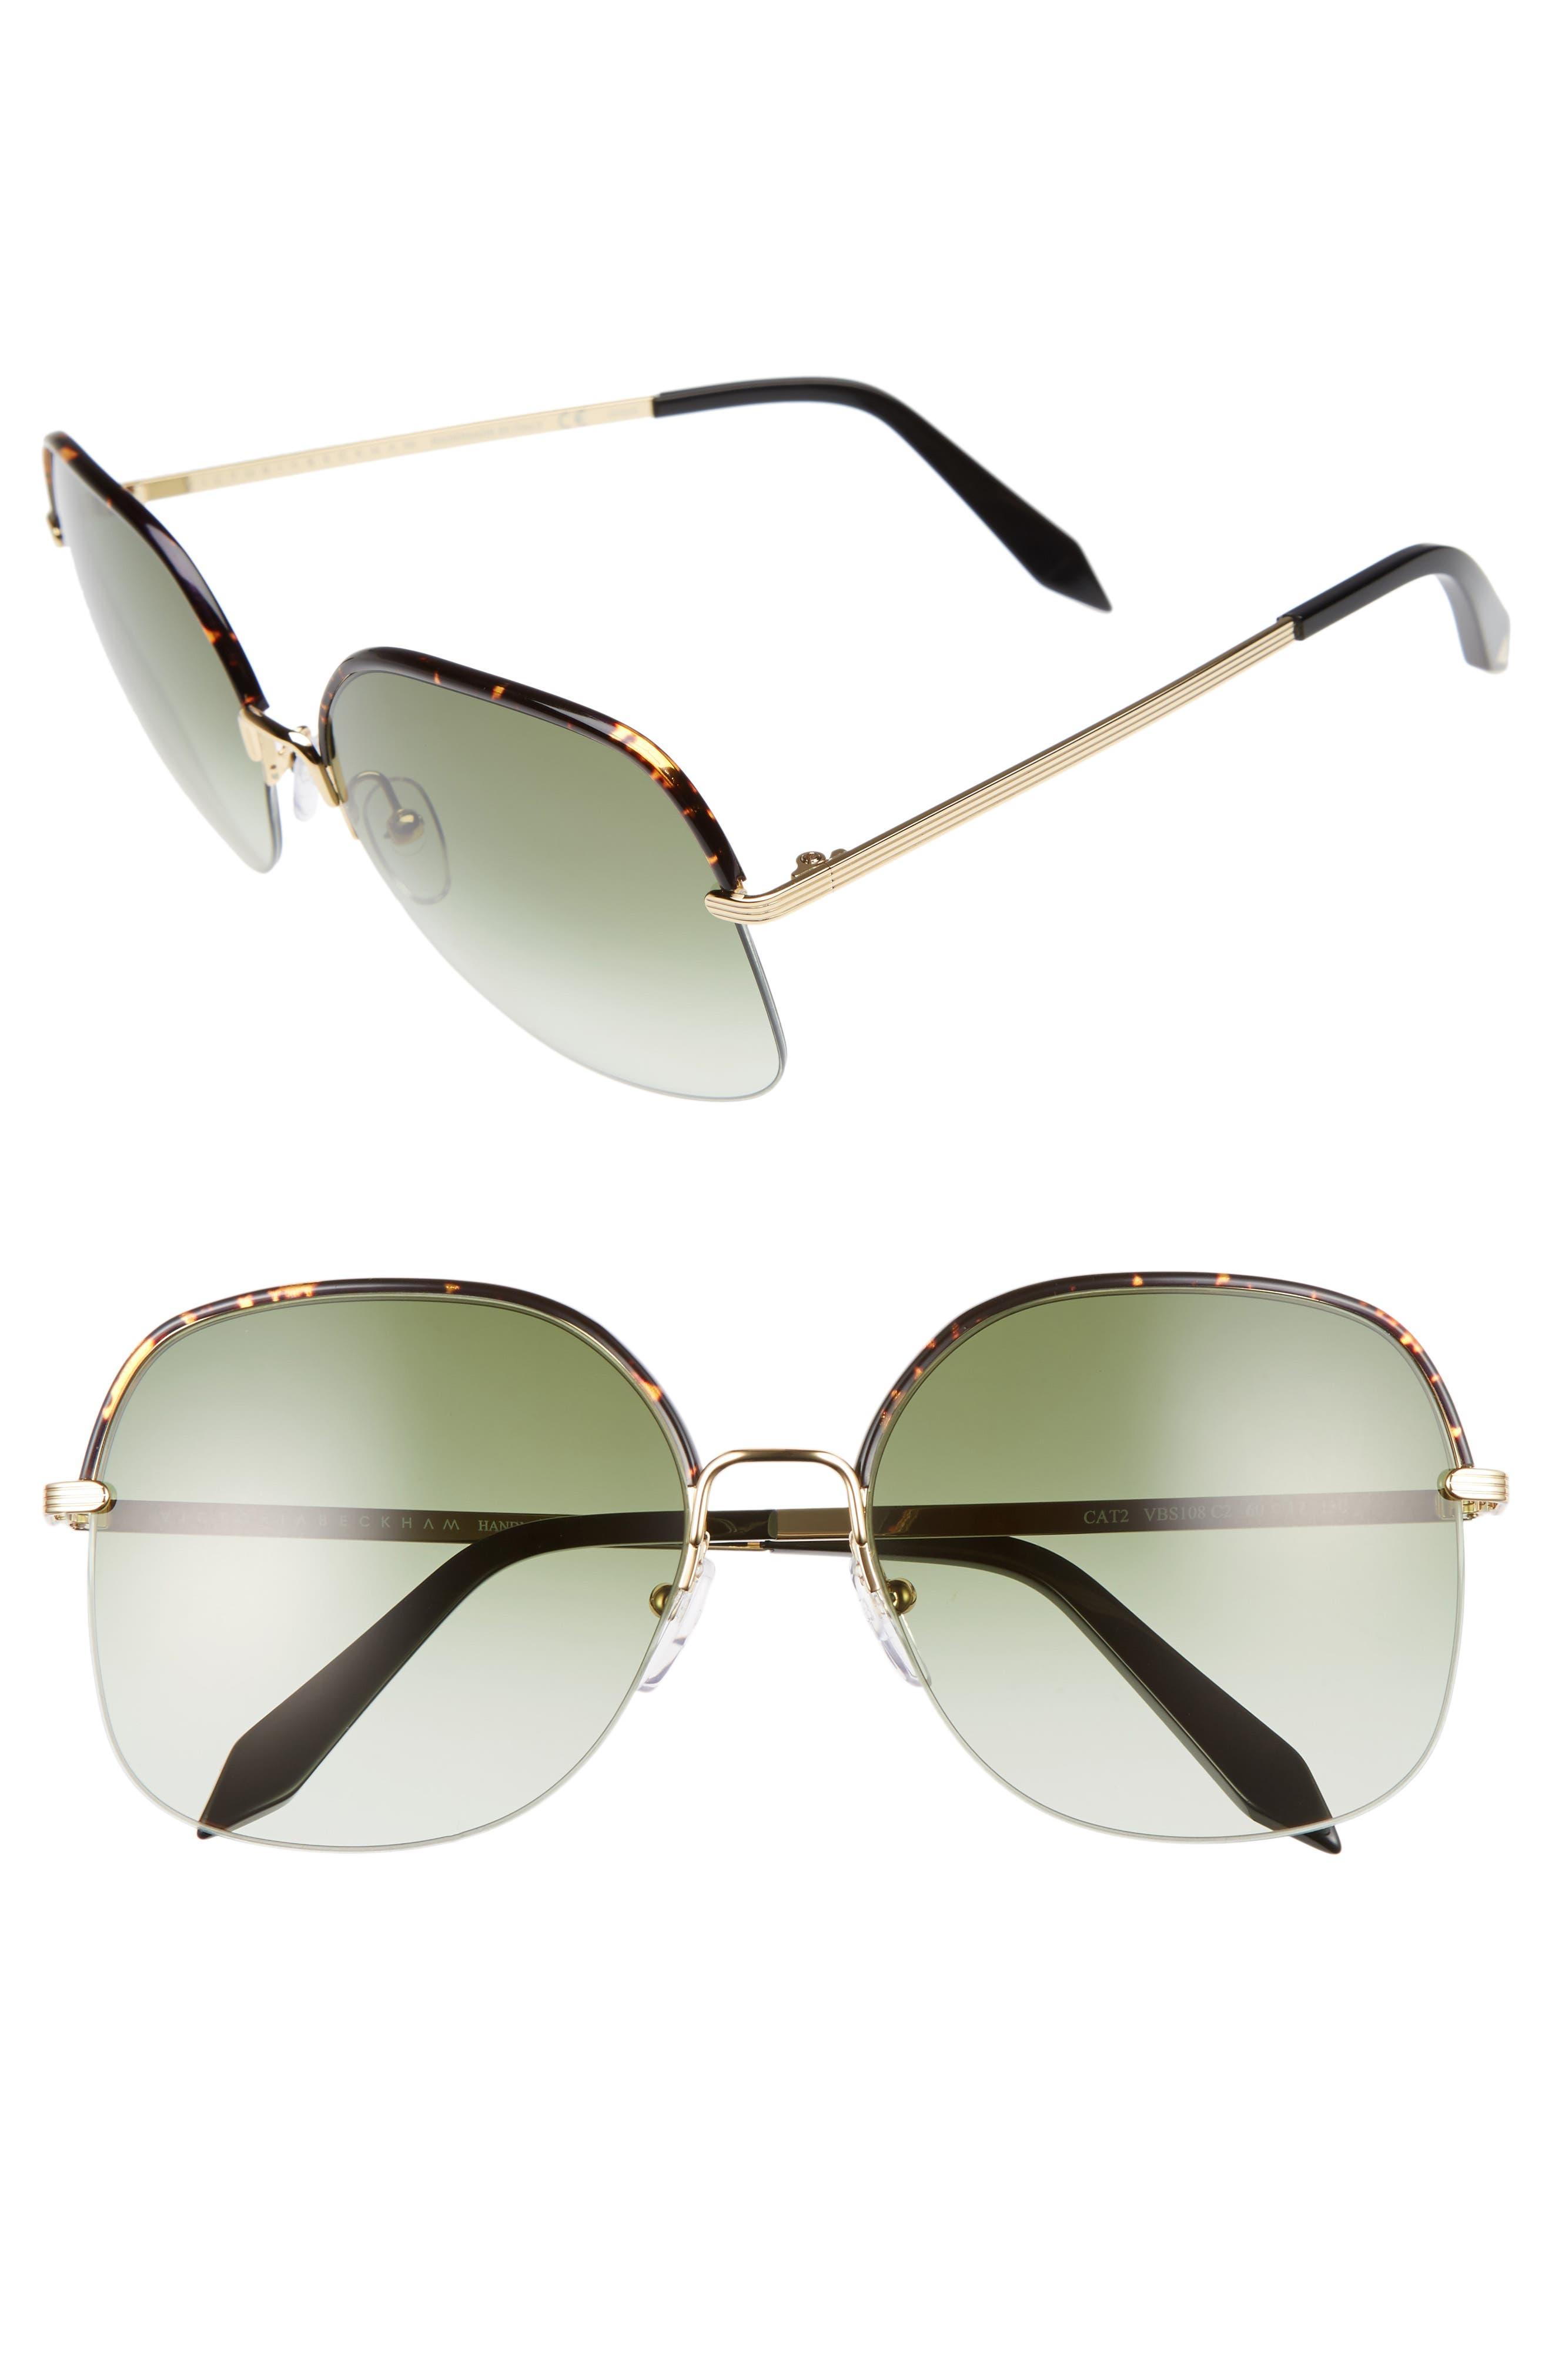 Main Image - Victoria Beckham Windsor 60mm Gradient Lens Square Sunglasses